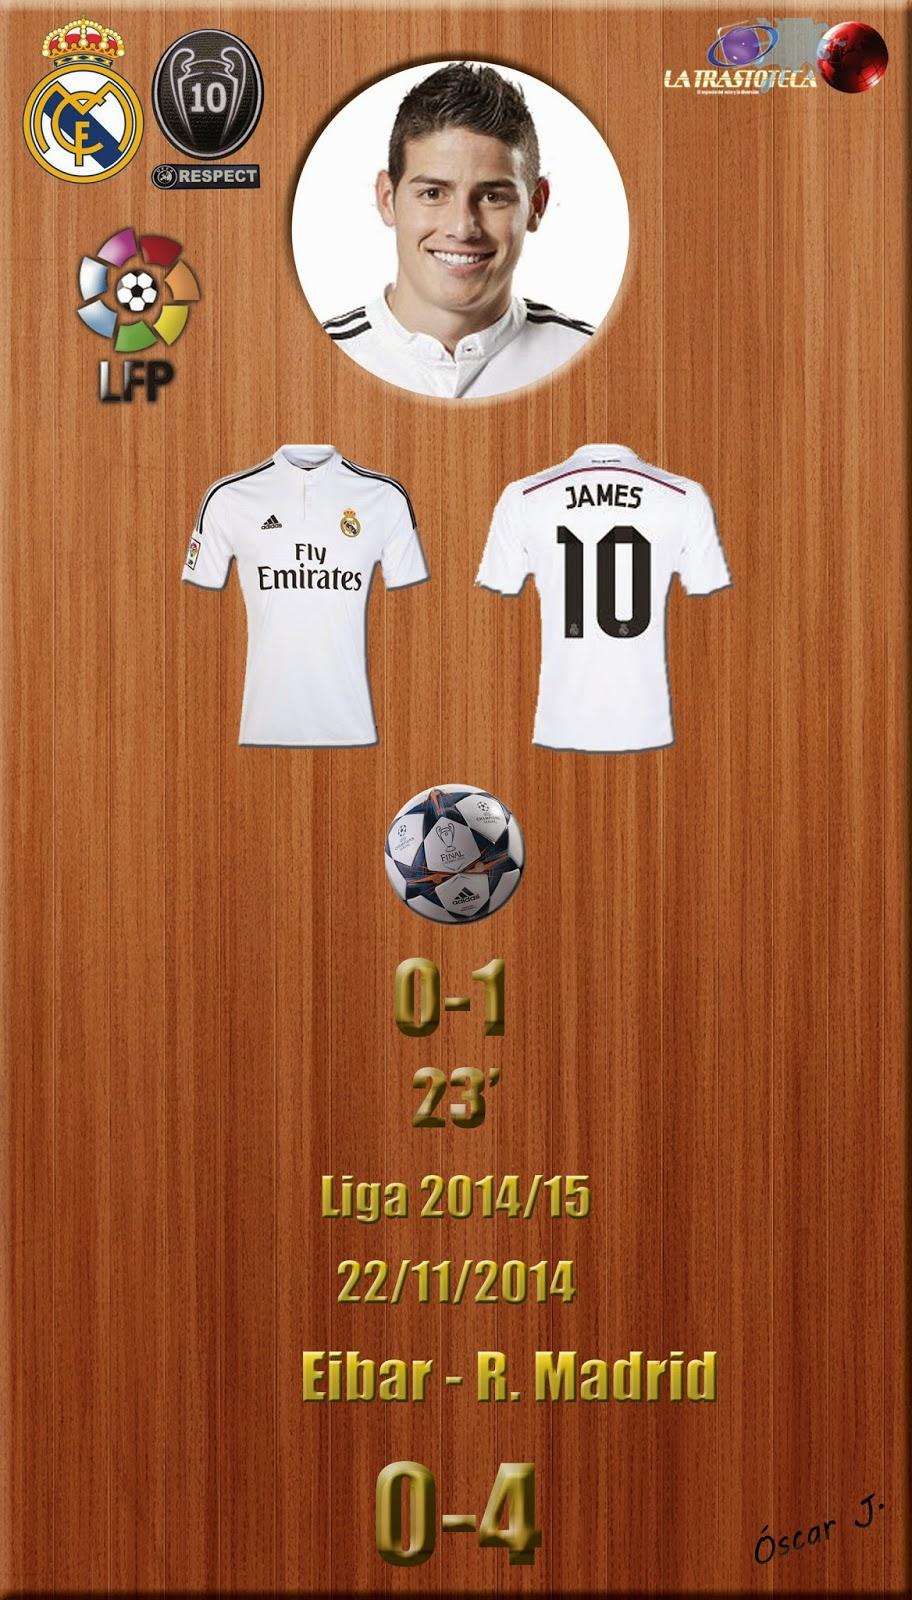 James Rodríguez (0-1) - Eibar 0-4 Real Madrid - Liga 2014/15 - Jornada 12 - (22/11/2014)